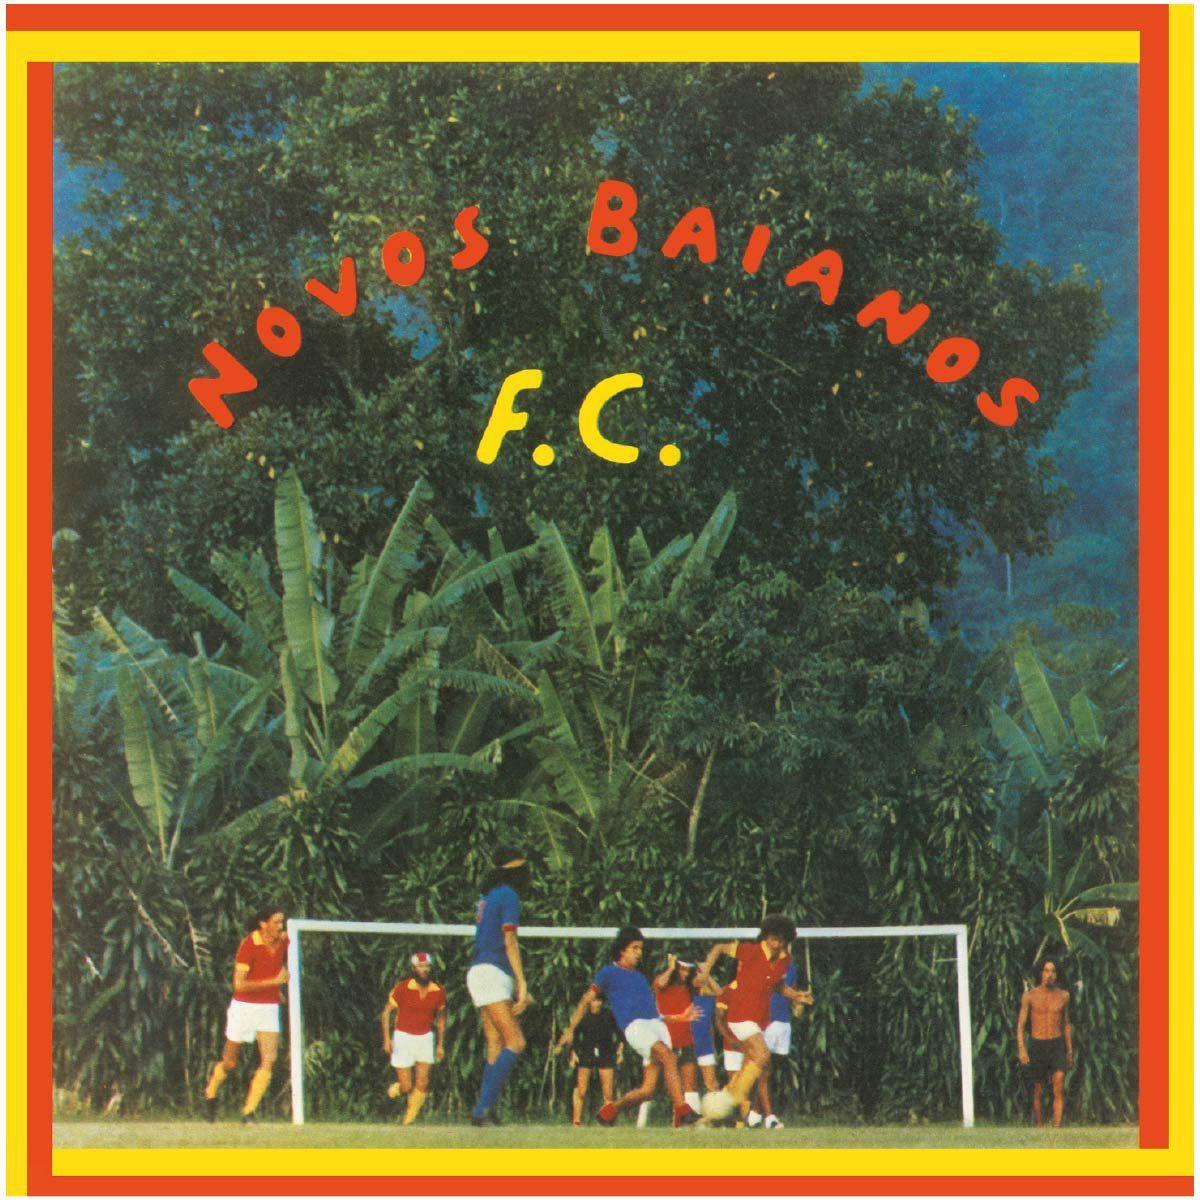 LP Novos Baianos Futebol Clube  - bandUP Store Marketplace